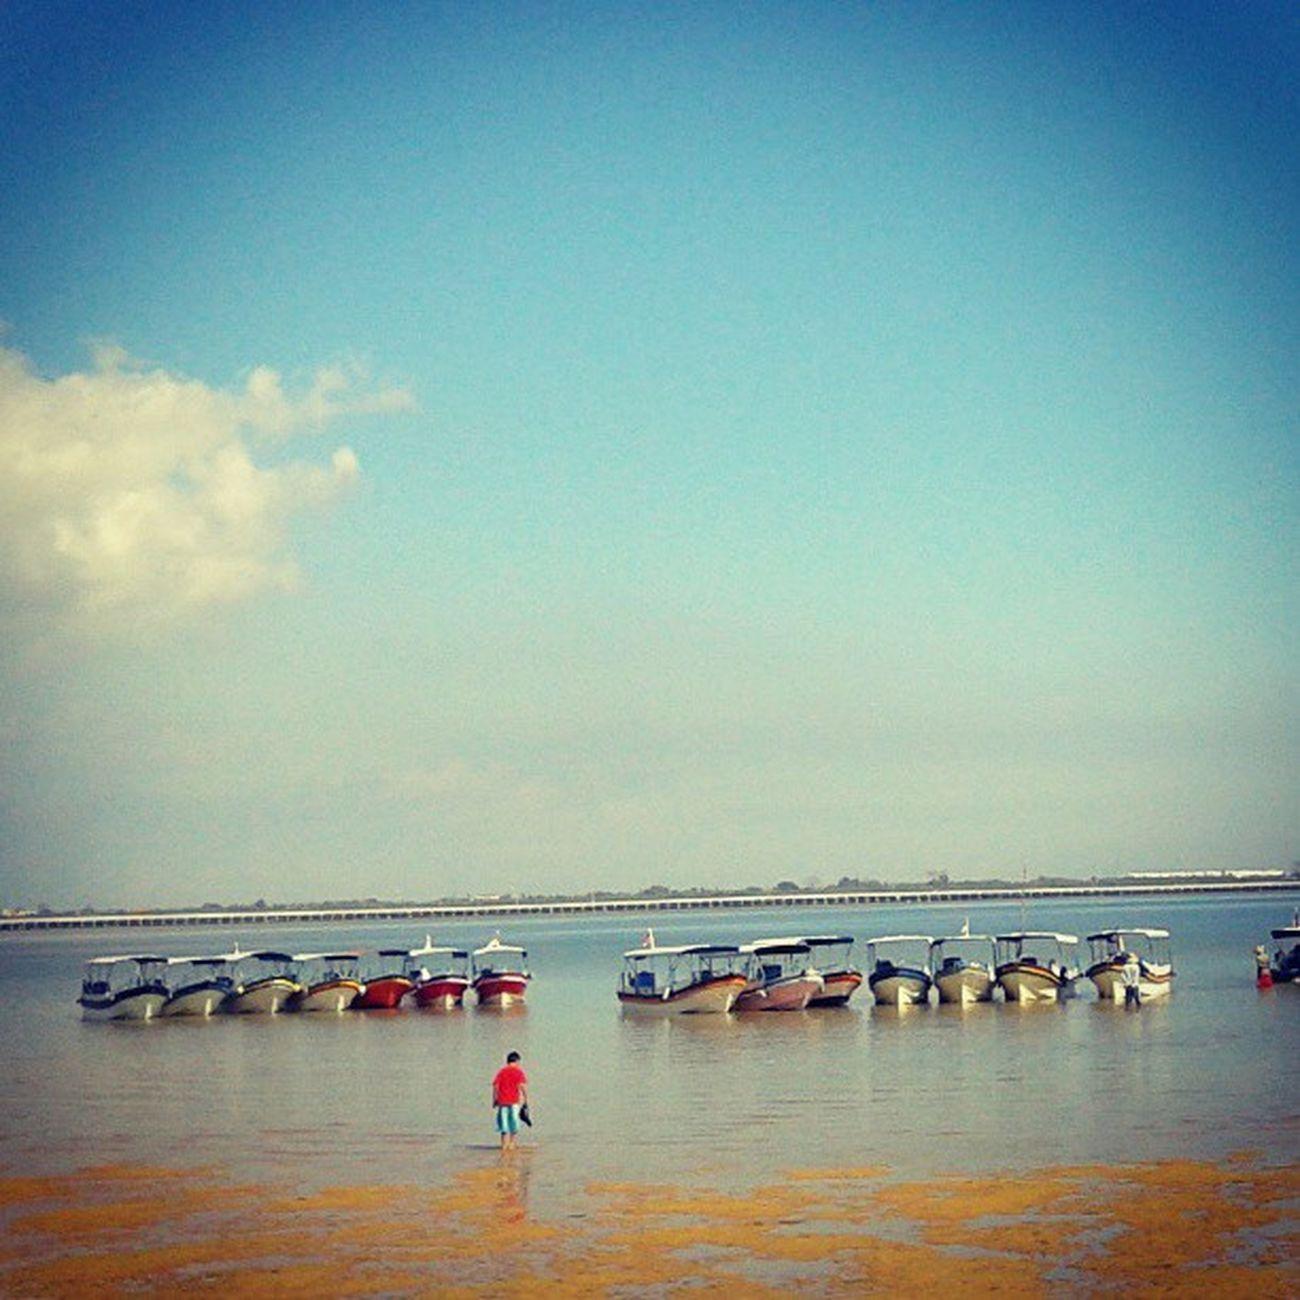 sailor red Beach Balibeach Sunset BaliSunset Sky Bluesky Skymadness Seasky Landscape Balilandscape Iglandscape Igbali Picoftheday Instanusantara Instanusantarabali Instanesia Photooftheday Instadaily Instagood Igers Bali INDONESIA LangitbaliPhotoworks